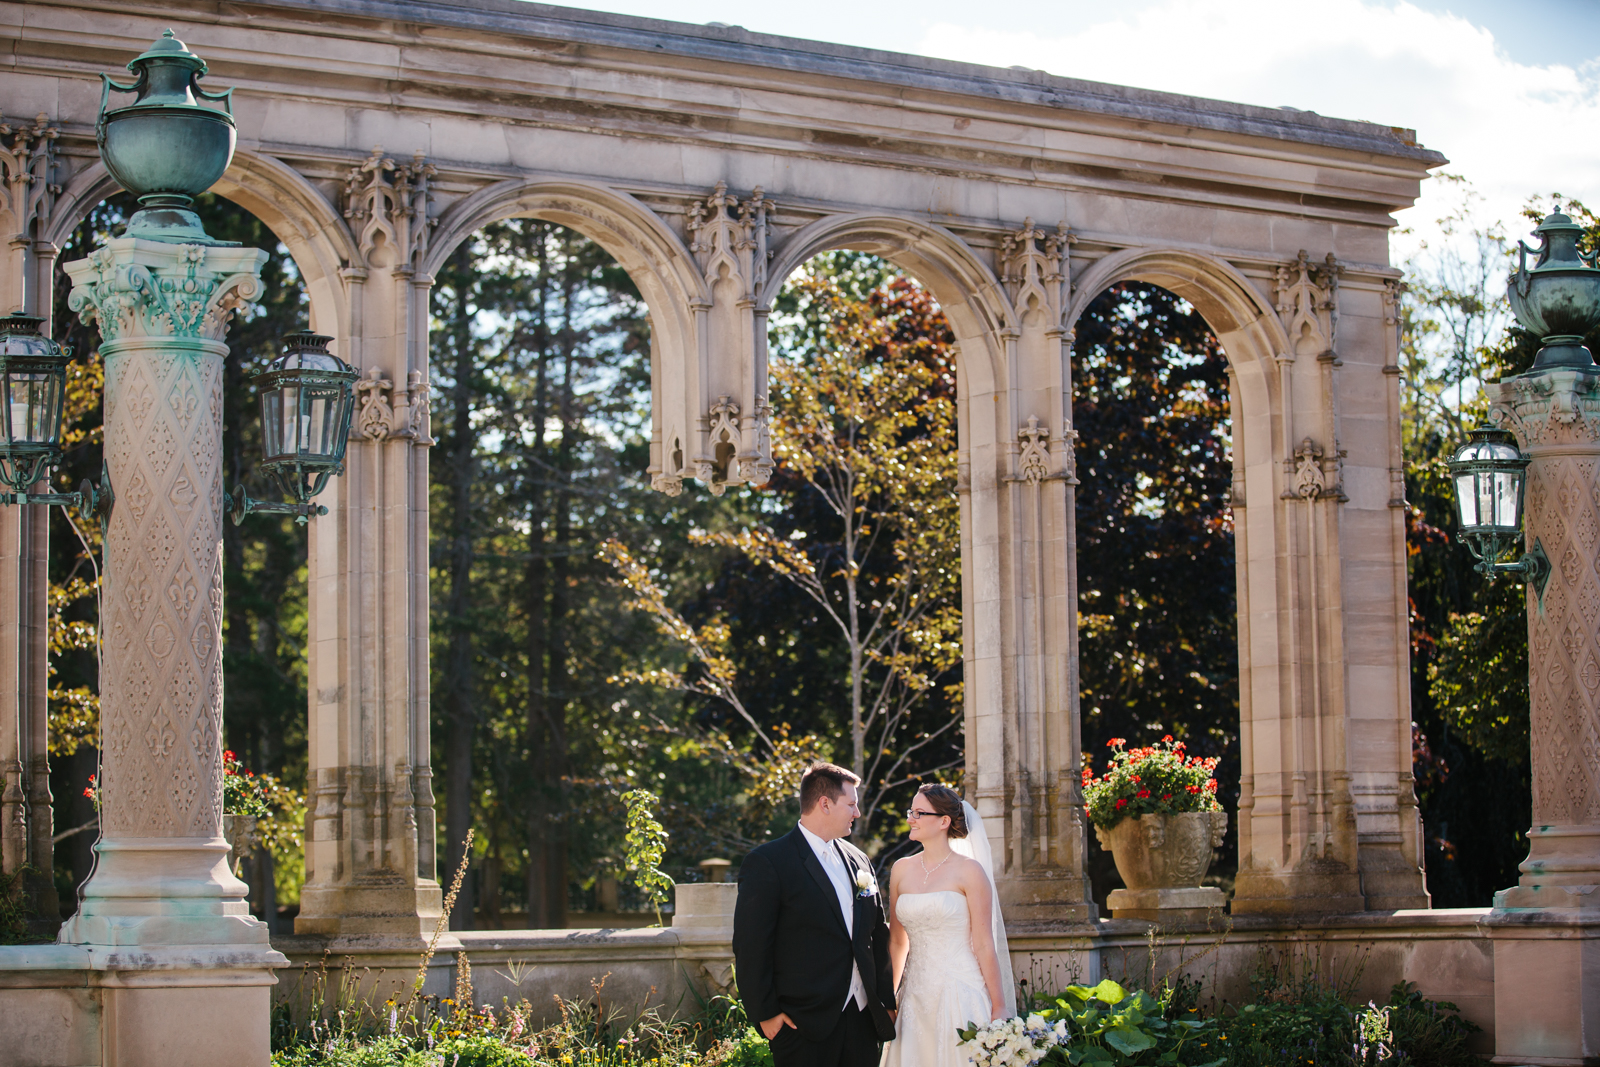 Eastons-Beach-Rotunda-Ballroom-Wedding-Newport-Rhode-Island-PhotographybyAmandaMorgan-60.jpg